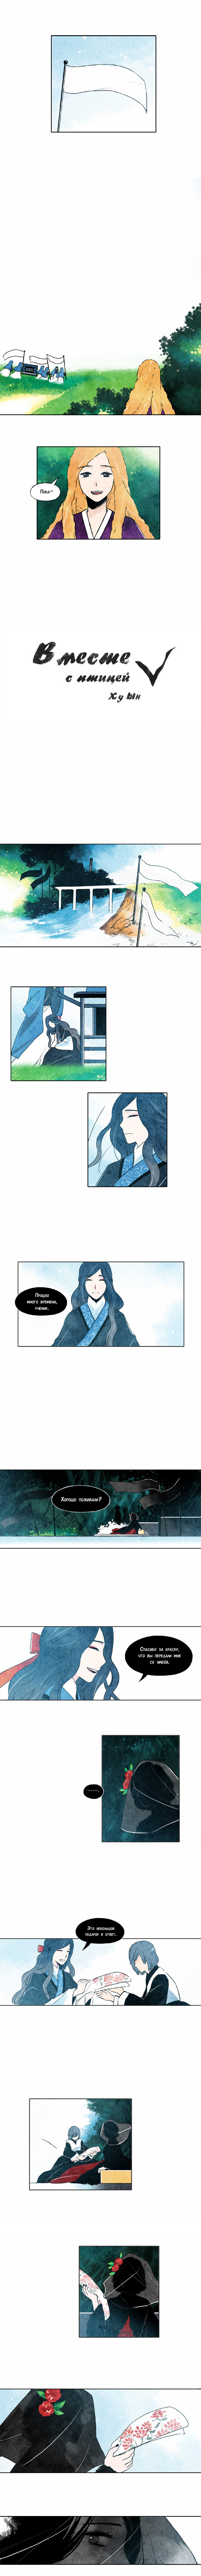 https://r1.ninemanga.com/comics/pic2/39/22503/416377/153288429126.jpg Page 1